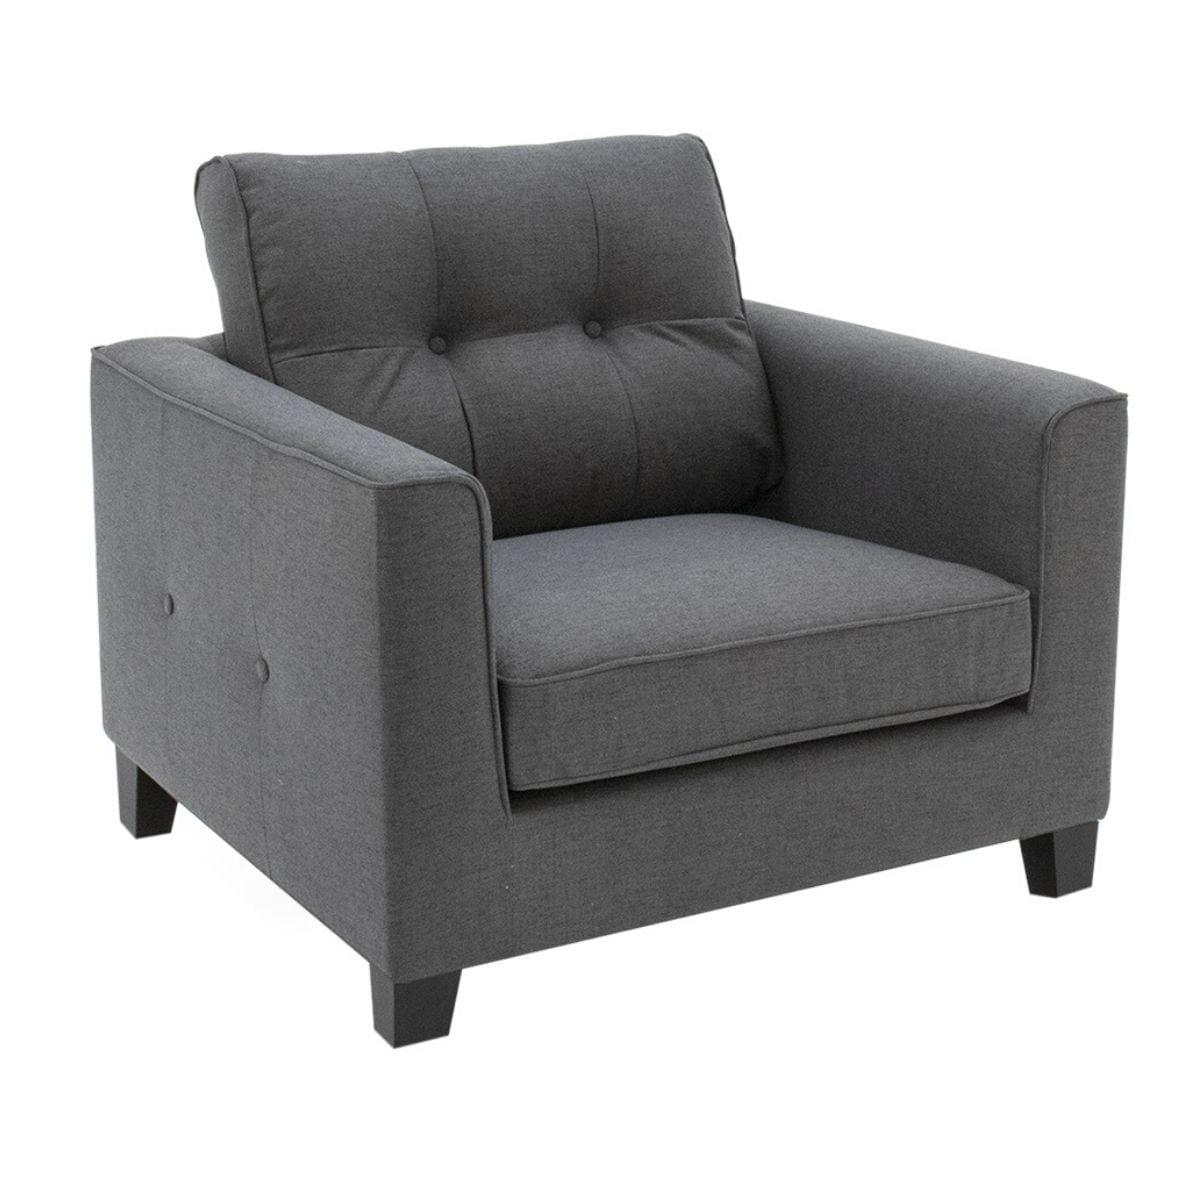 grey-fabric-armchair